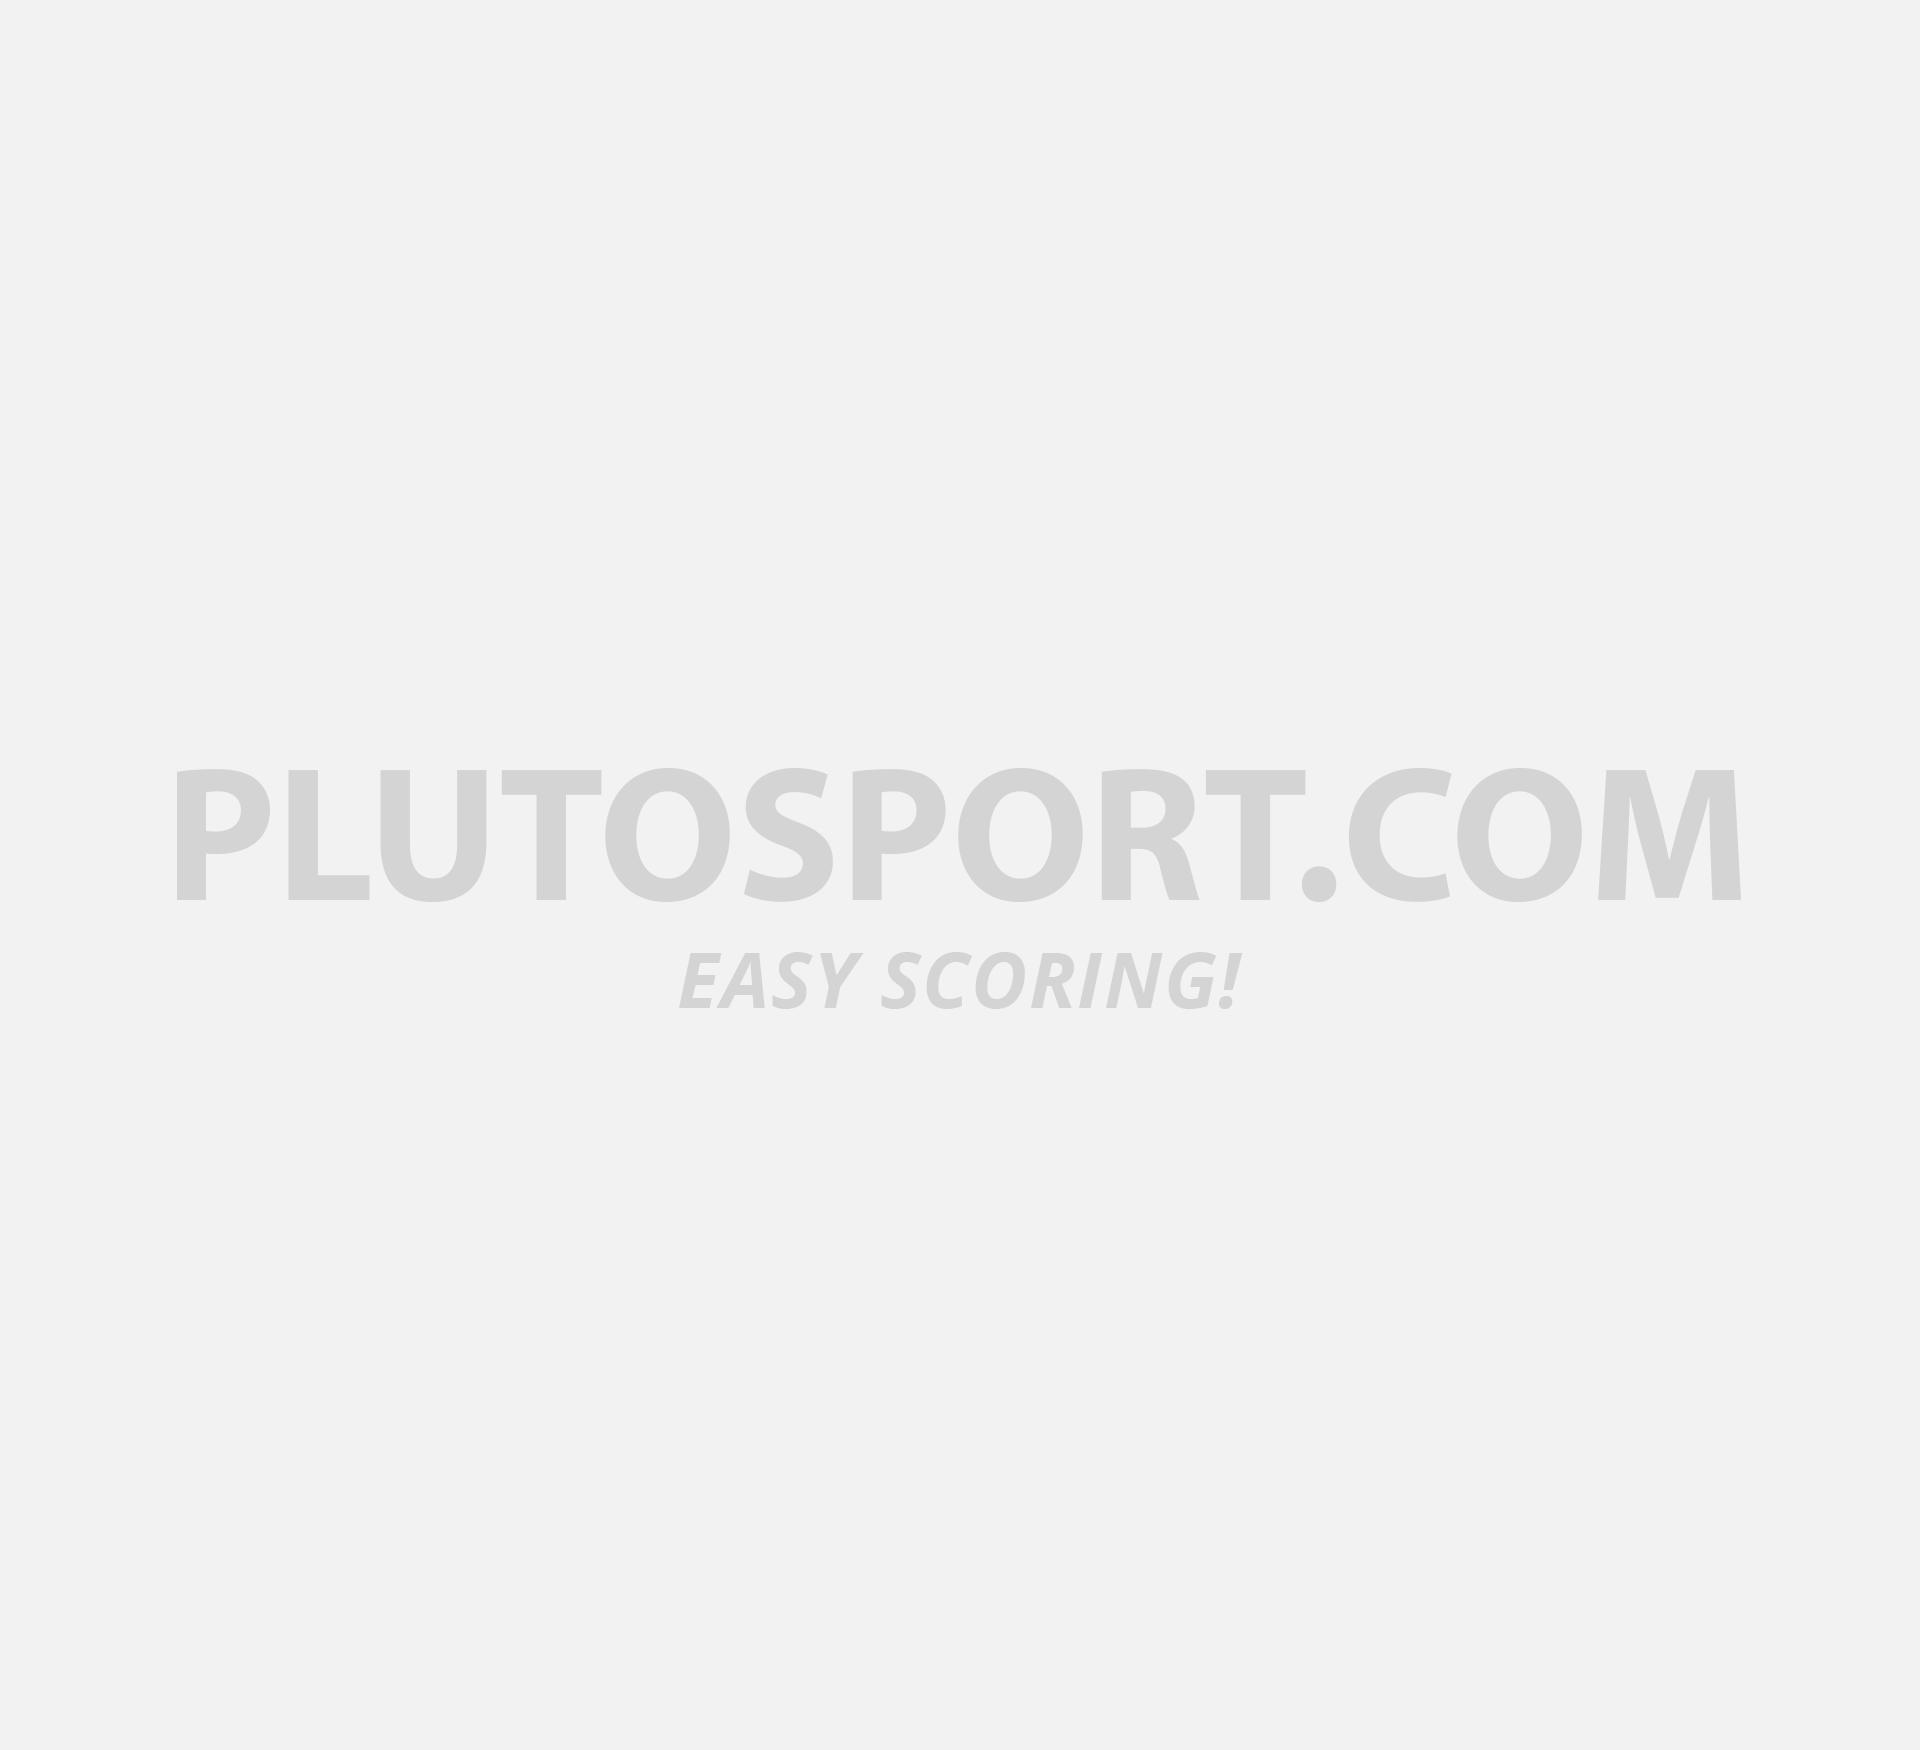 Calvin Klein Boxershort Low Rise(3-pack) Men